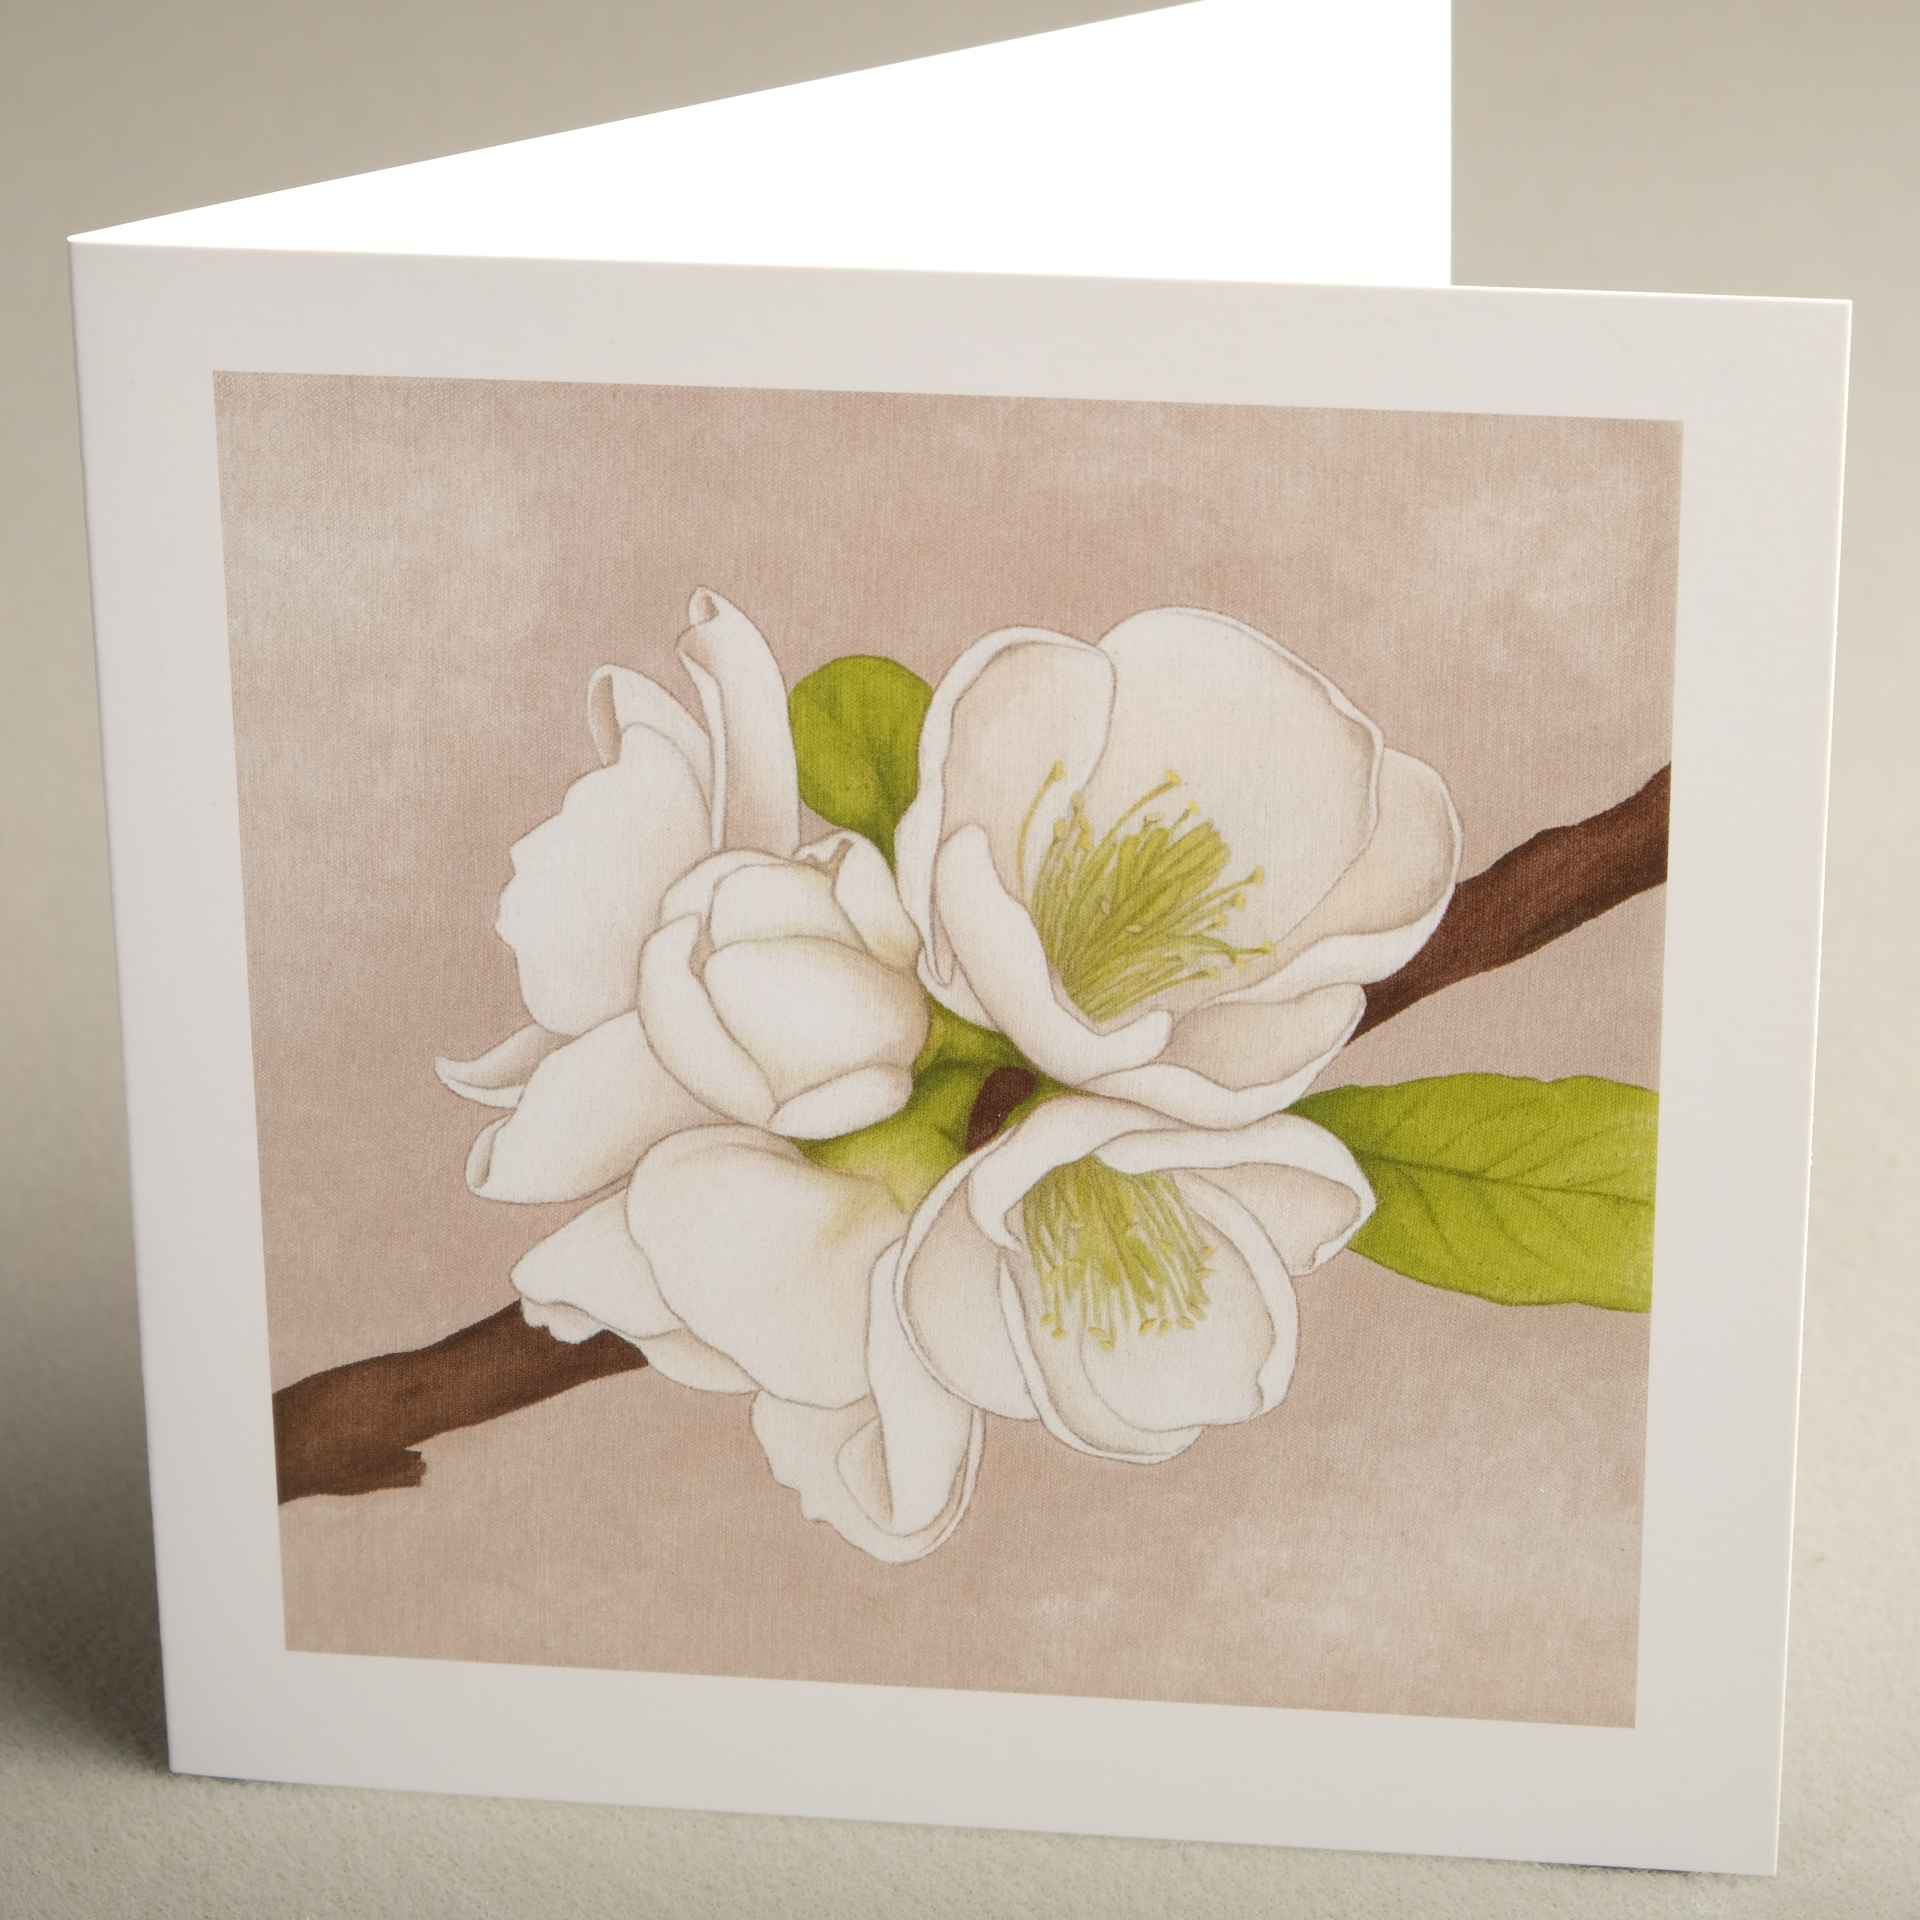 Floral Greetings Cards From Jaci Hogan Art Flower Design Greetings